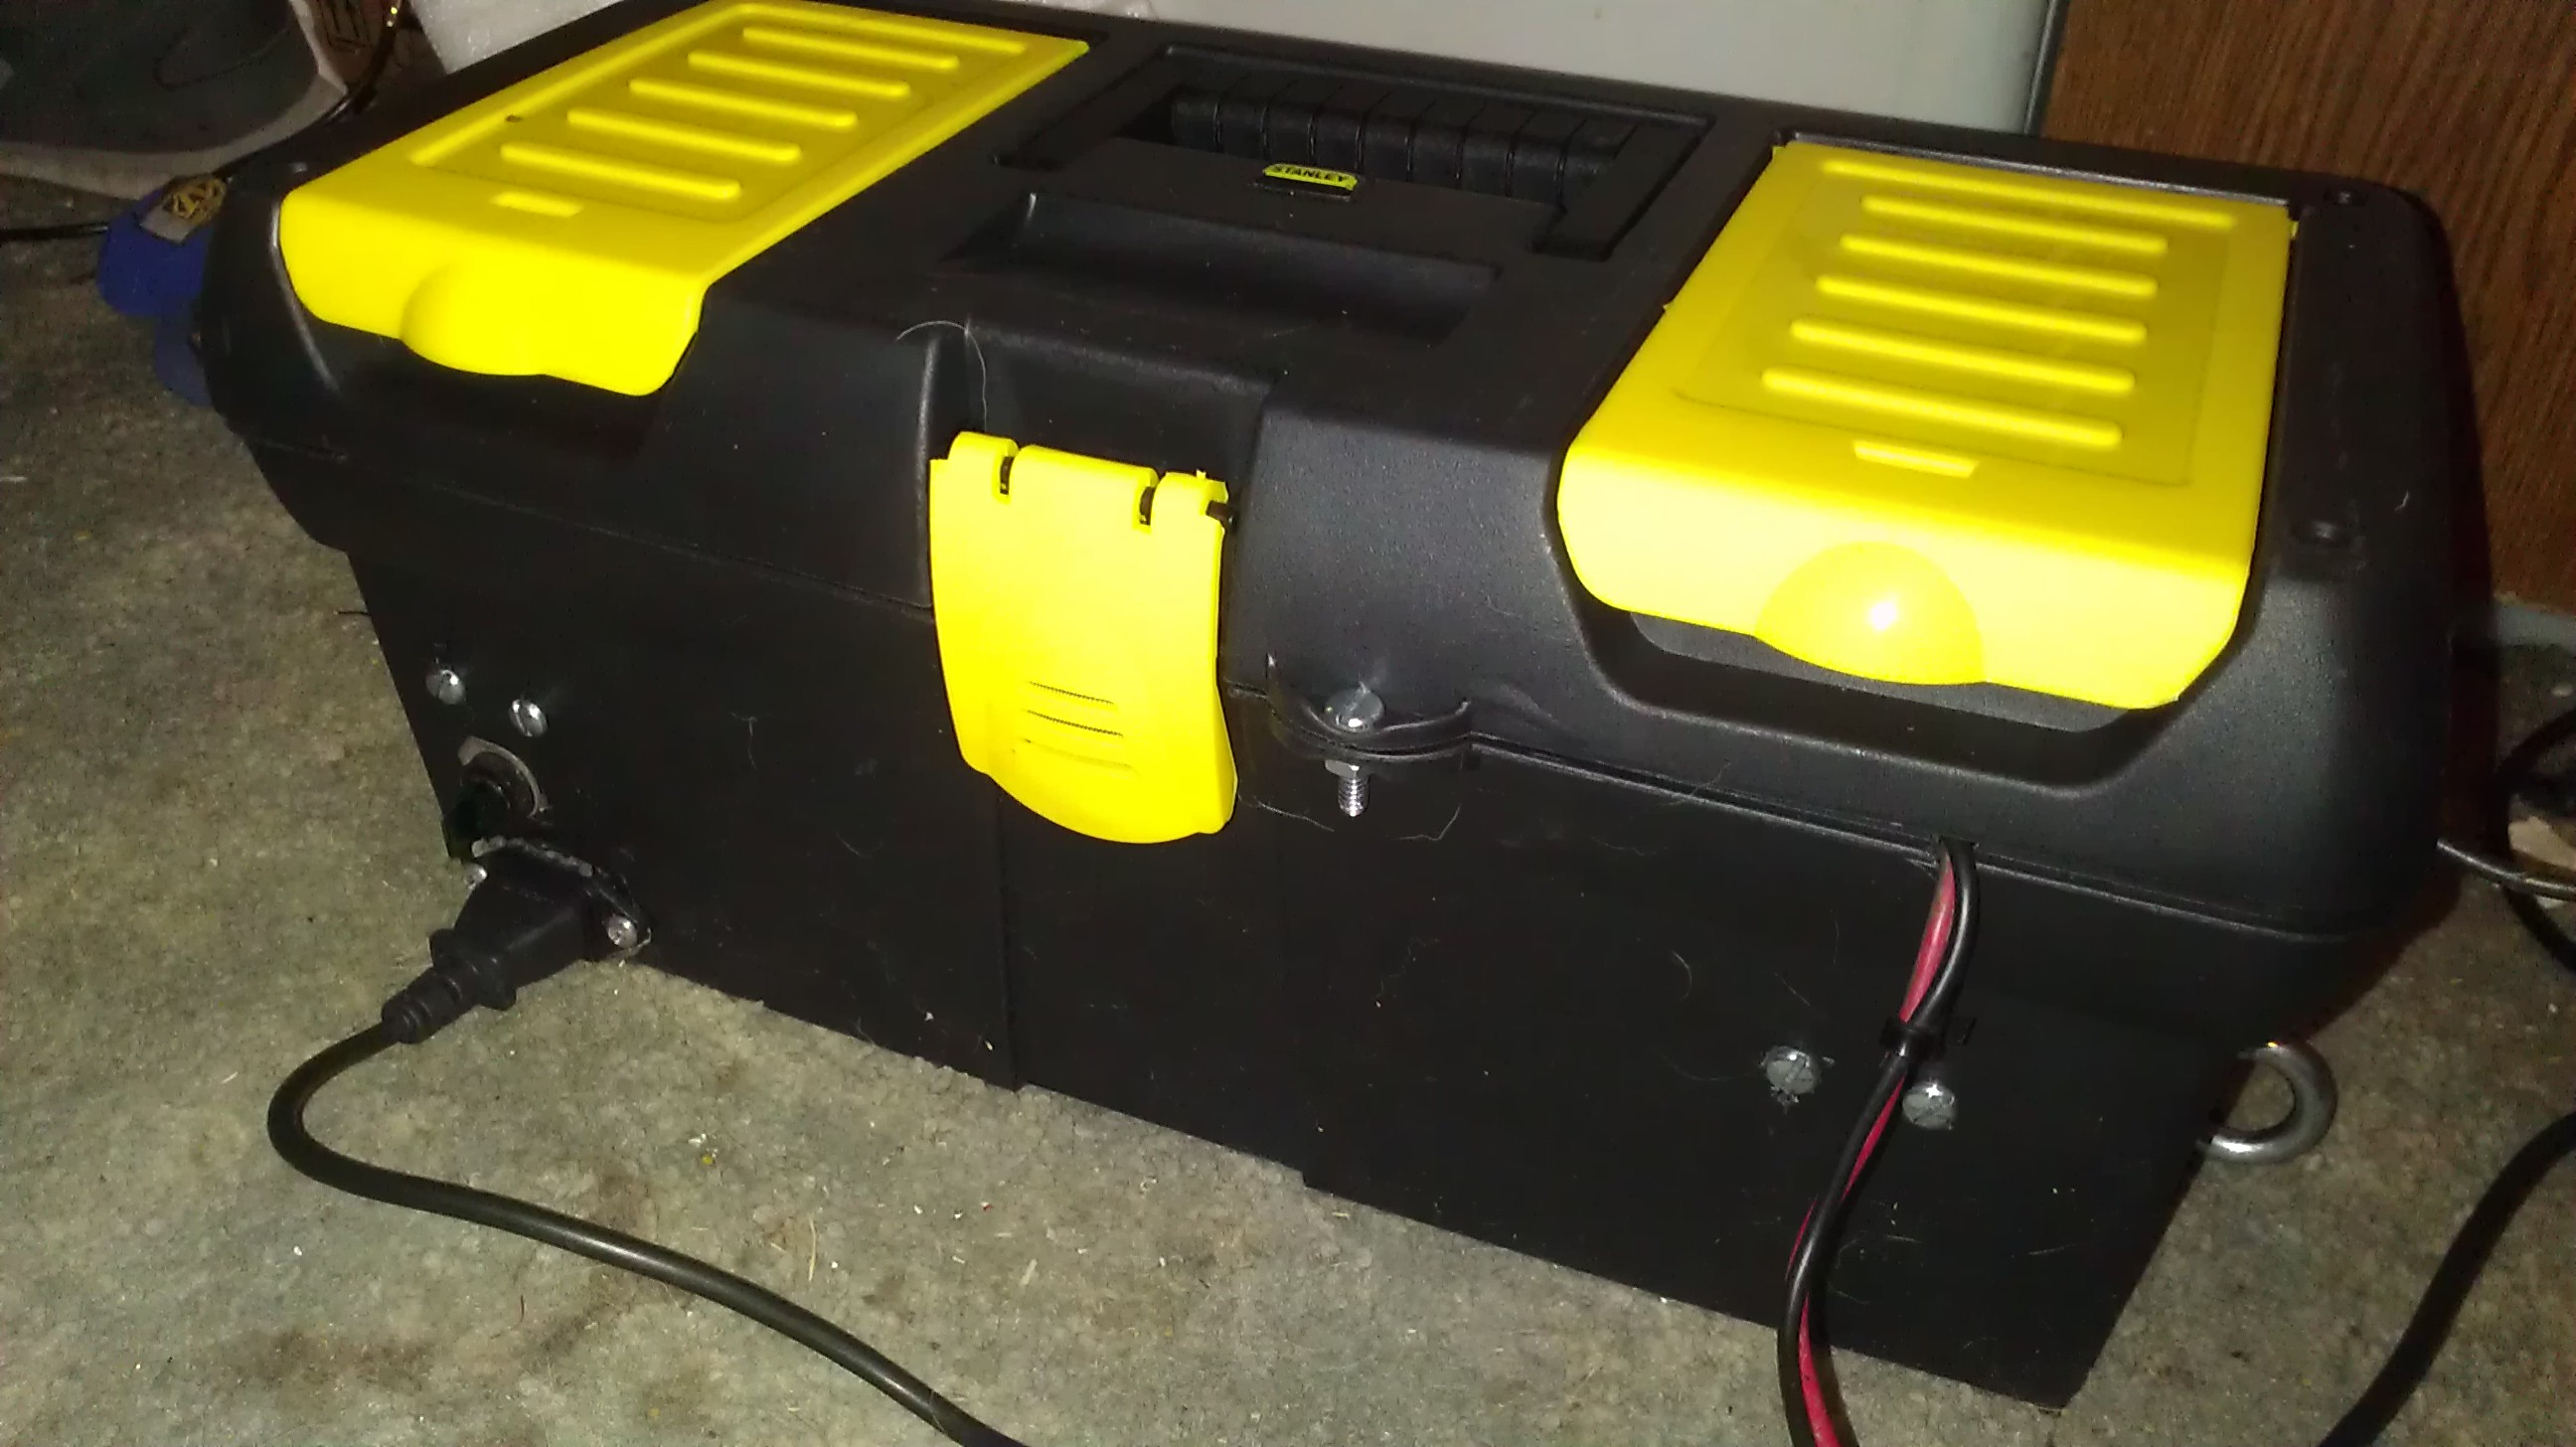 Battery box (outside view)